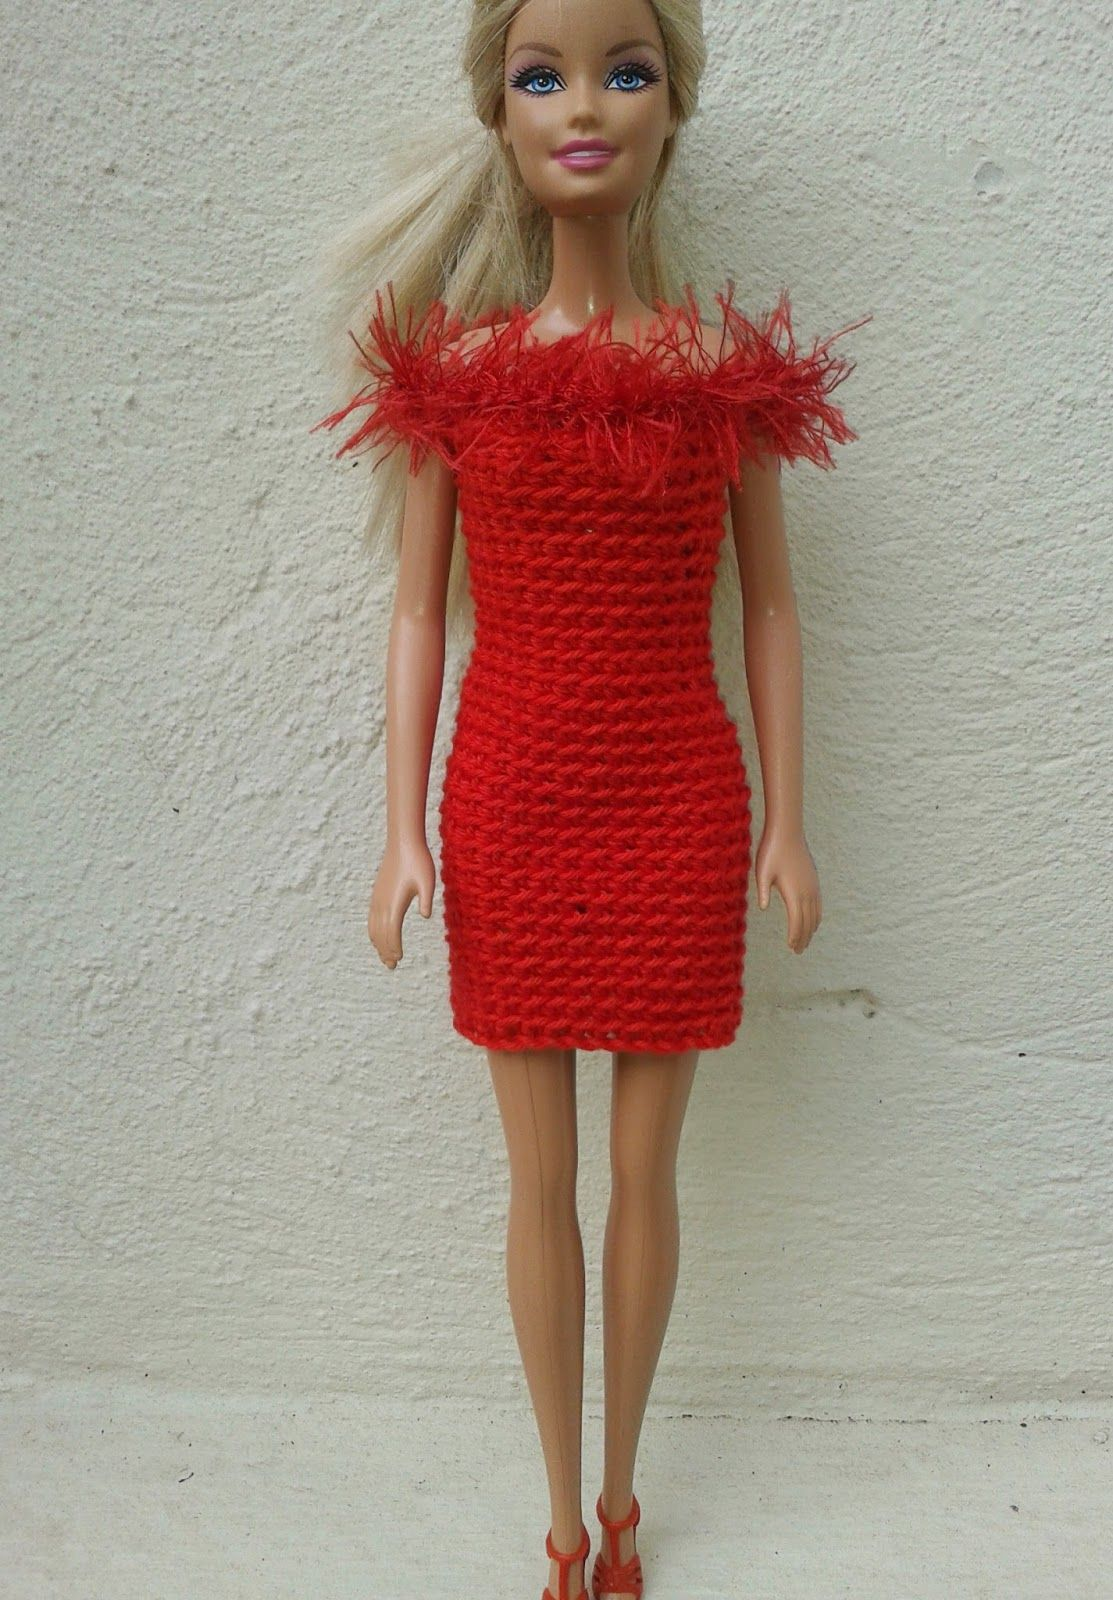 A simple crochet pattern using basic stitches for 3 styles of red a simple crochet pattern using basic stitches for 3 styles of red dress fluffy neckline peplum bankloansurffo Choice Image